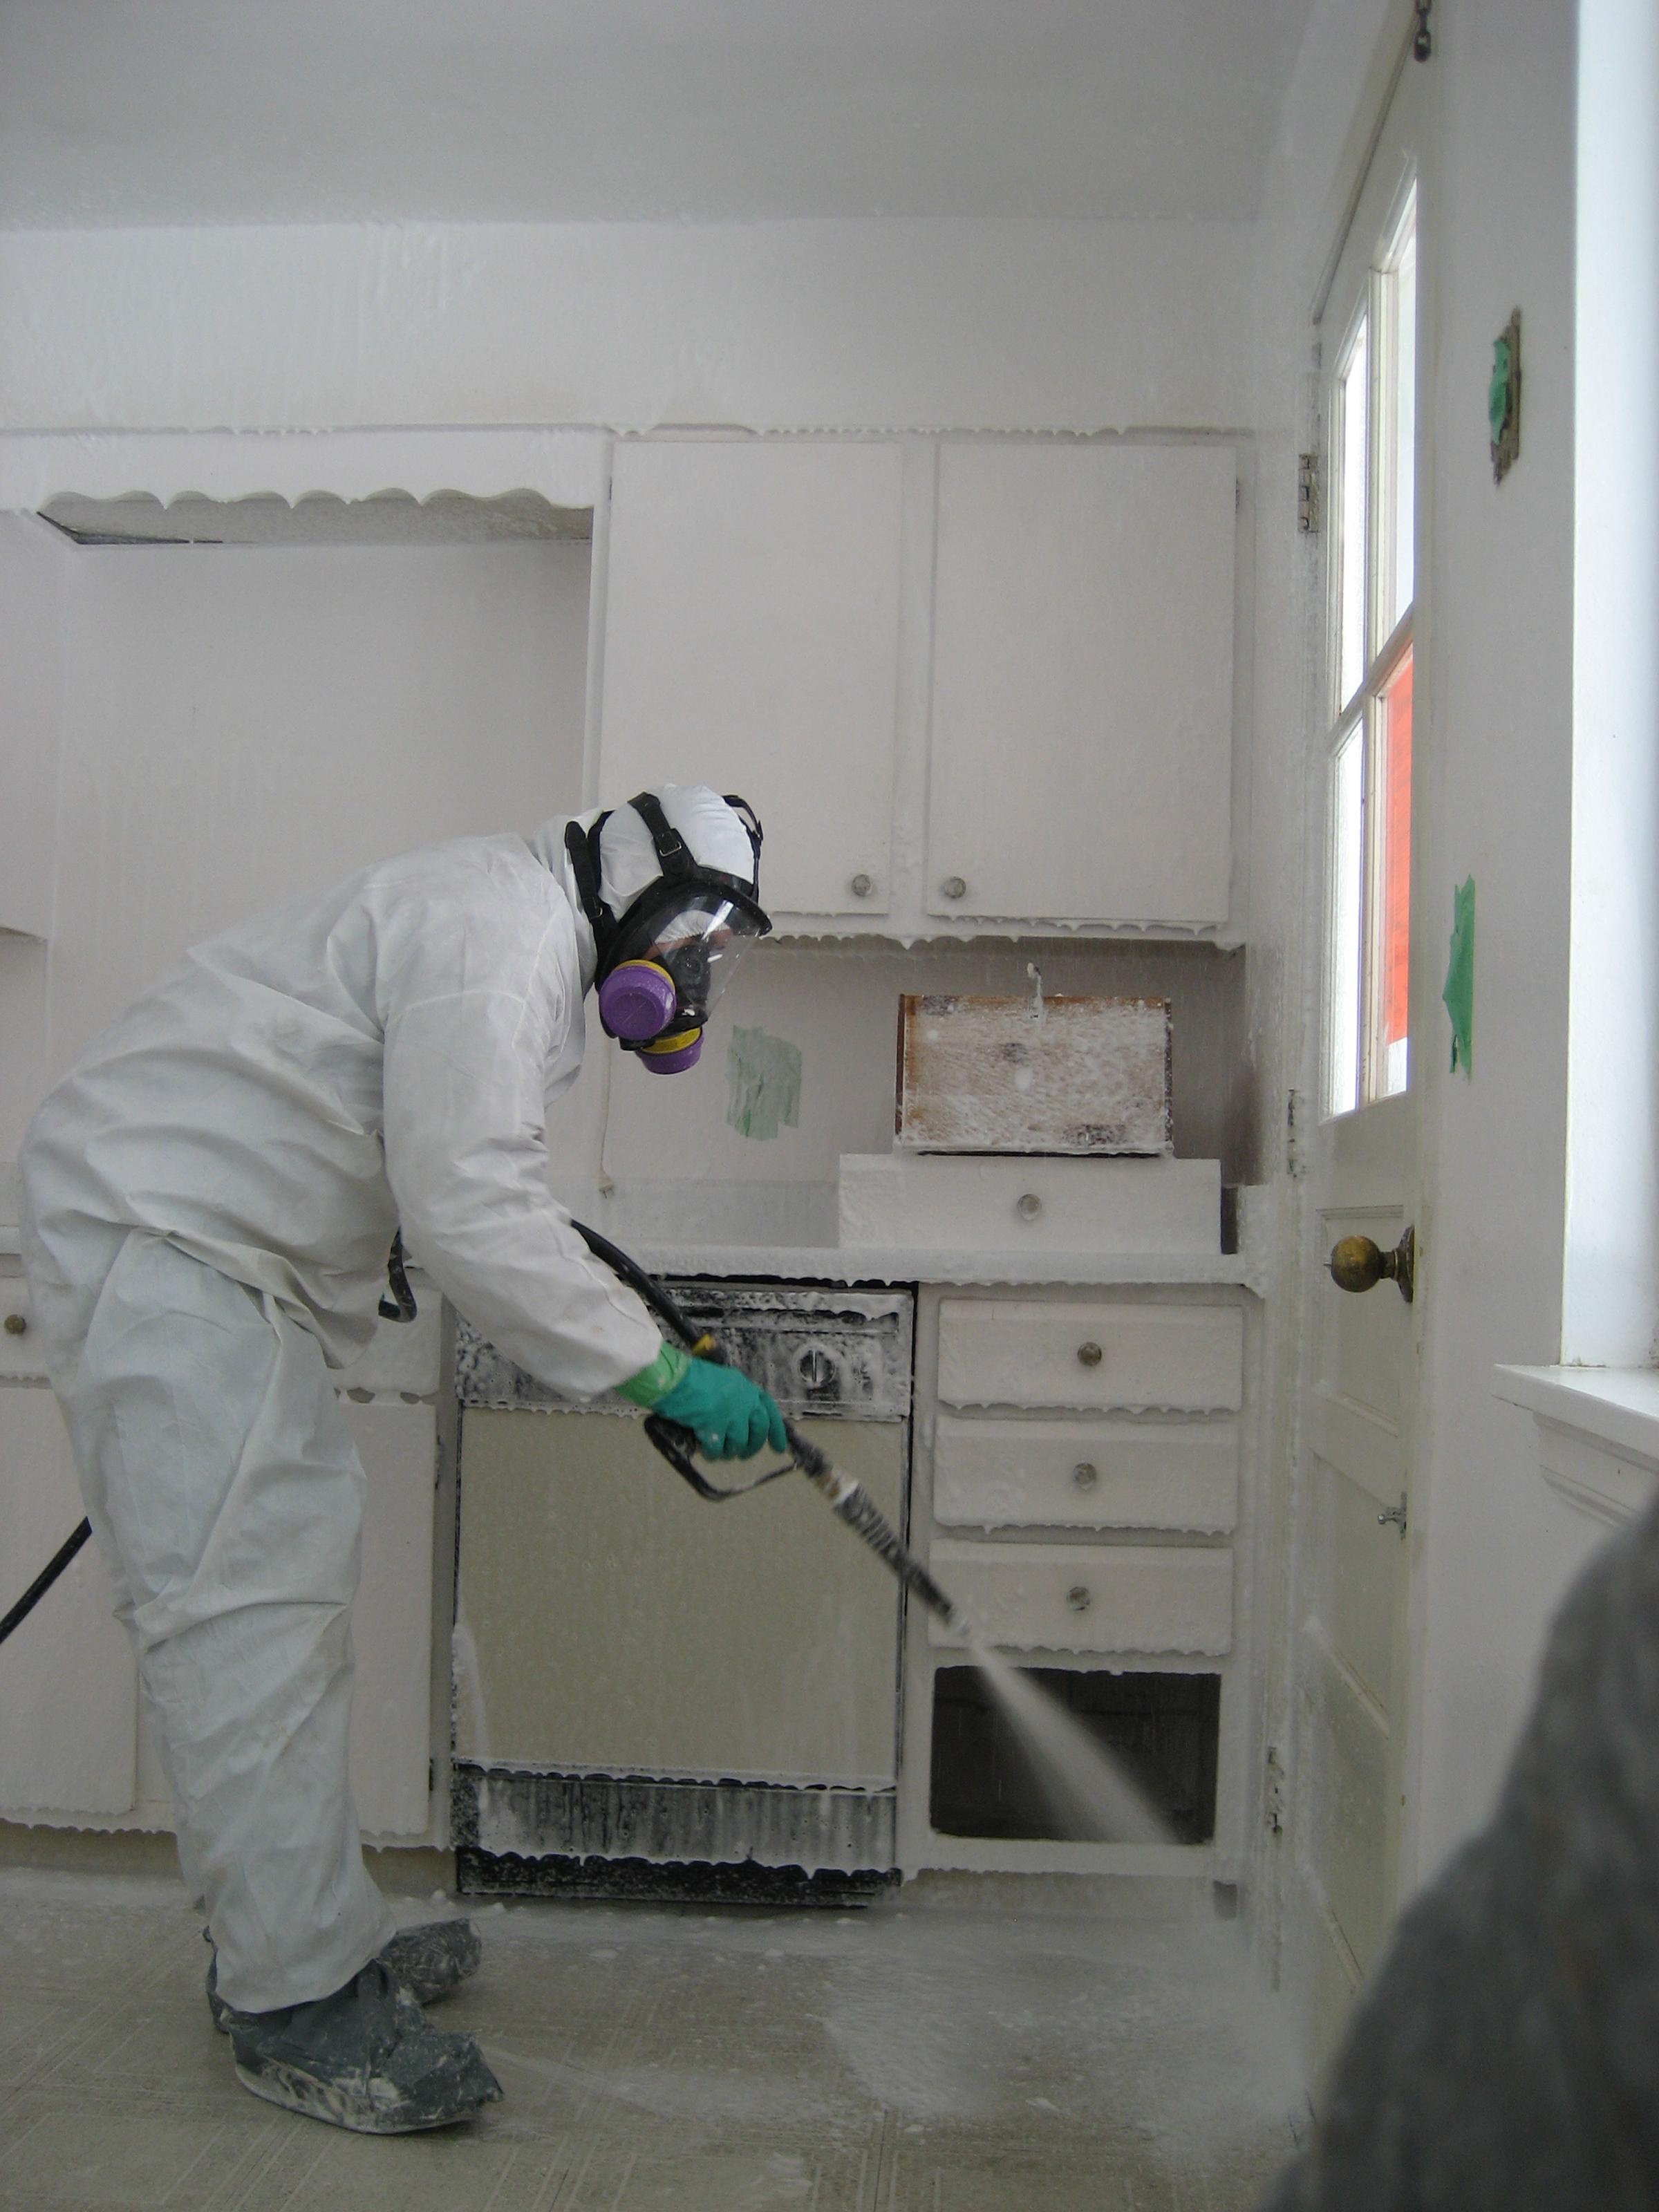 Sandia National Laboratories: News Releases : Anthrax-killing foam